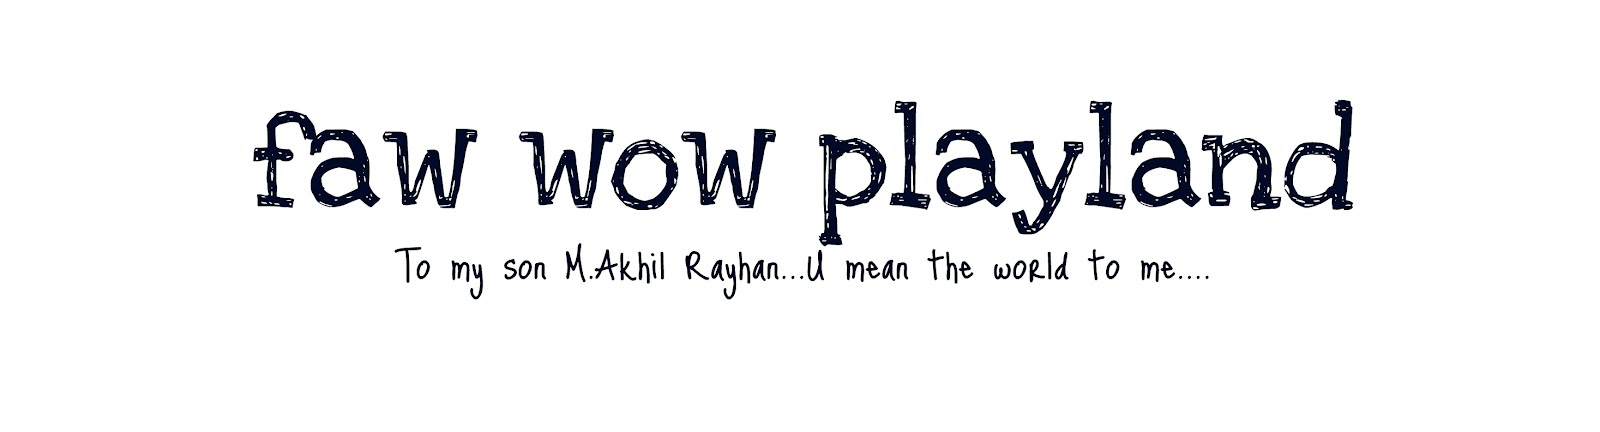 faw wow playland